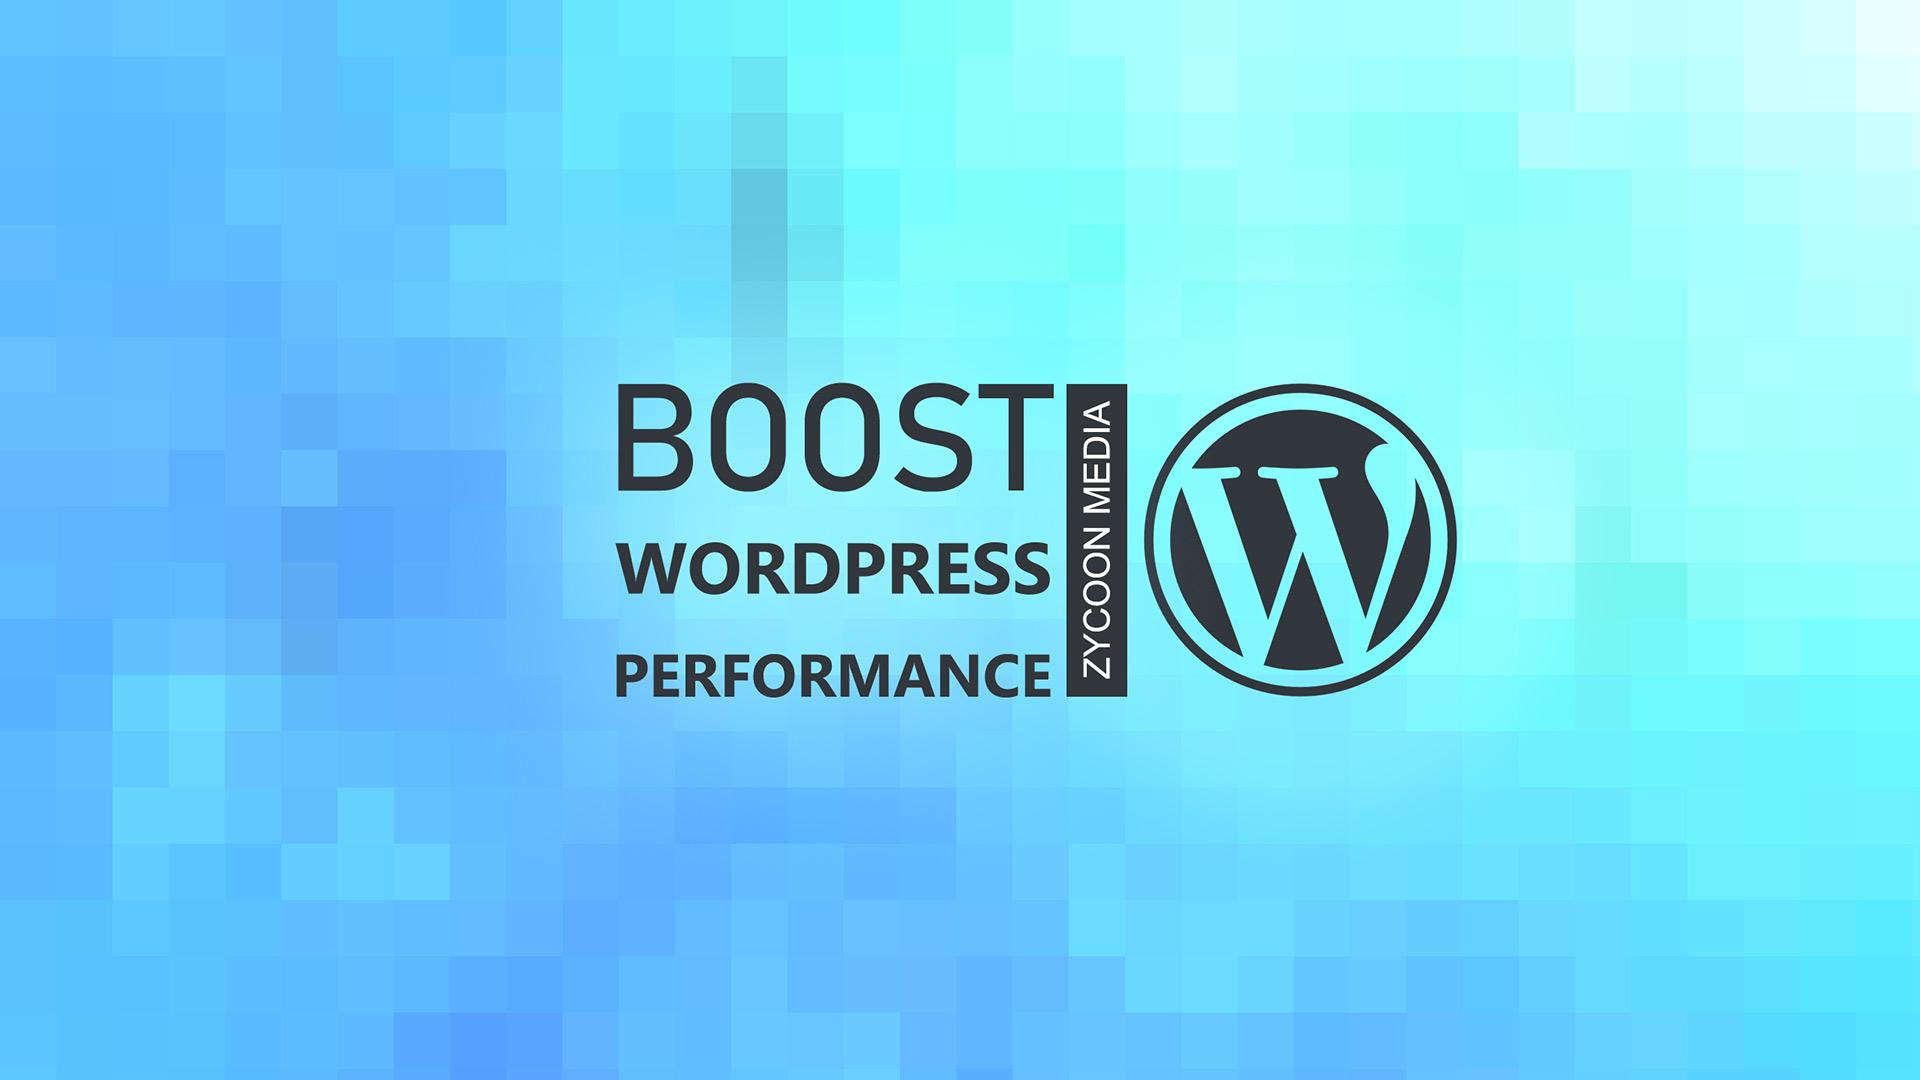 boost wordpress speed performance